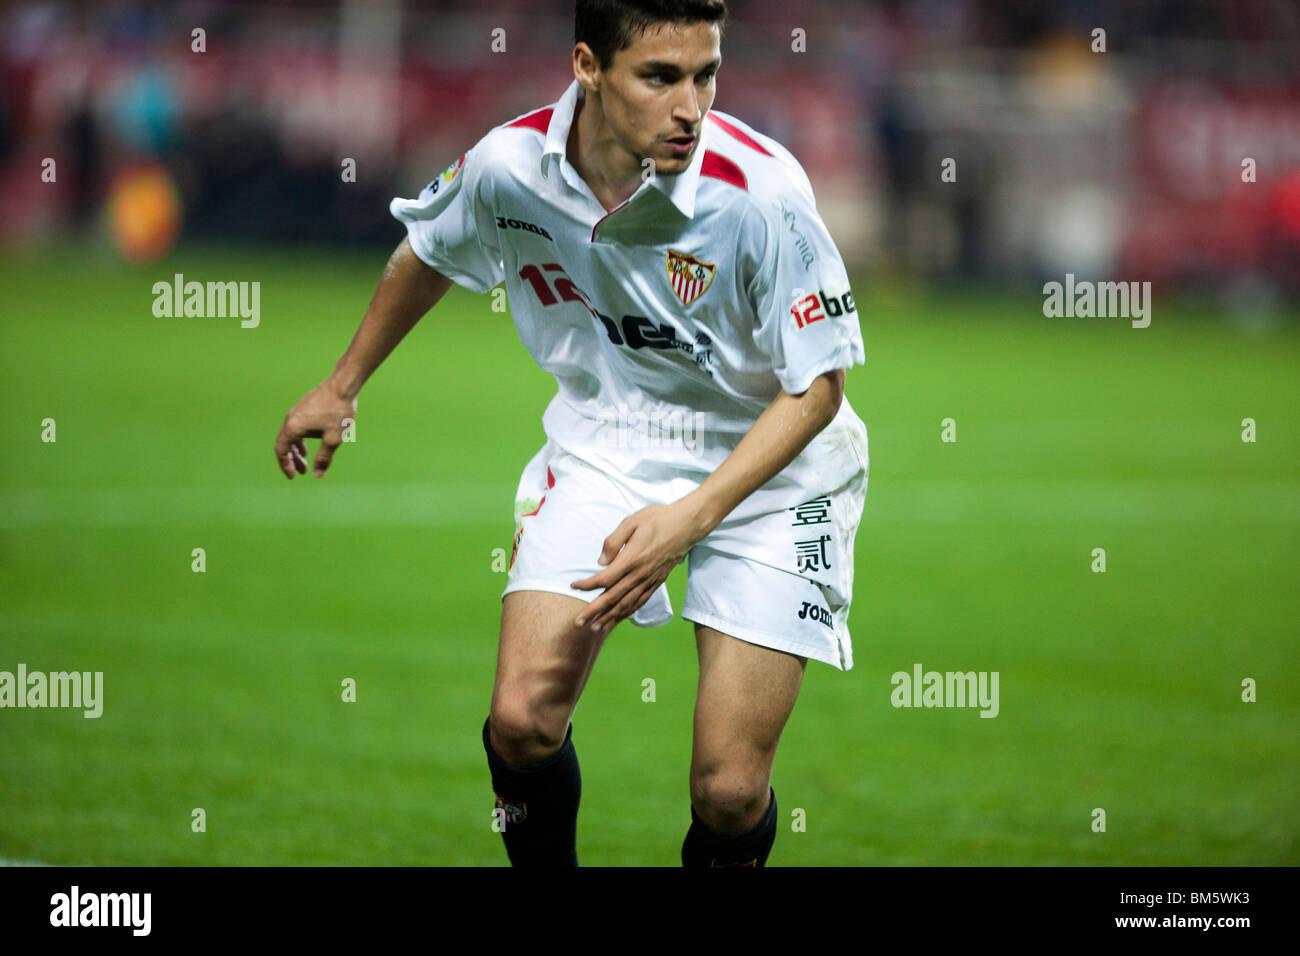 Jesus Navas looking at the game. - Stock Image